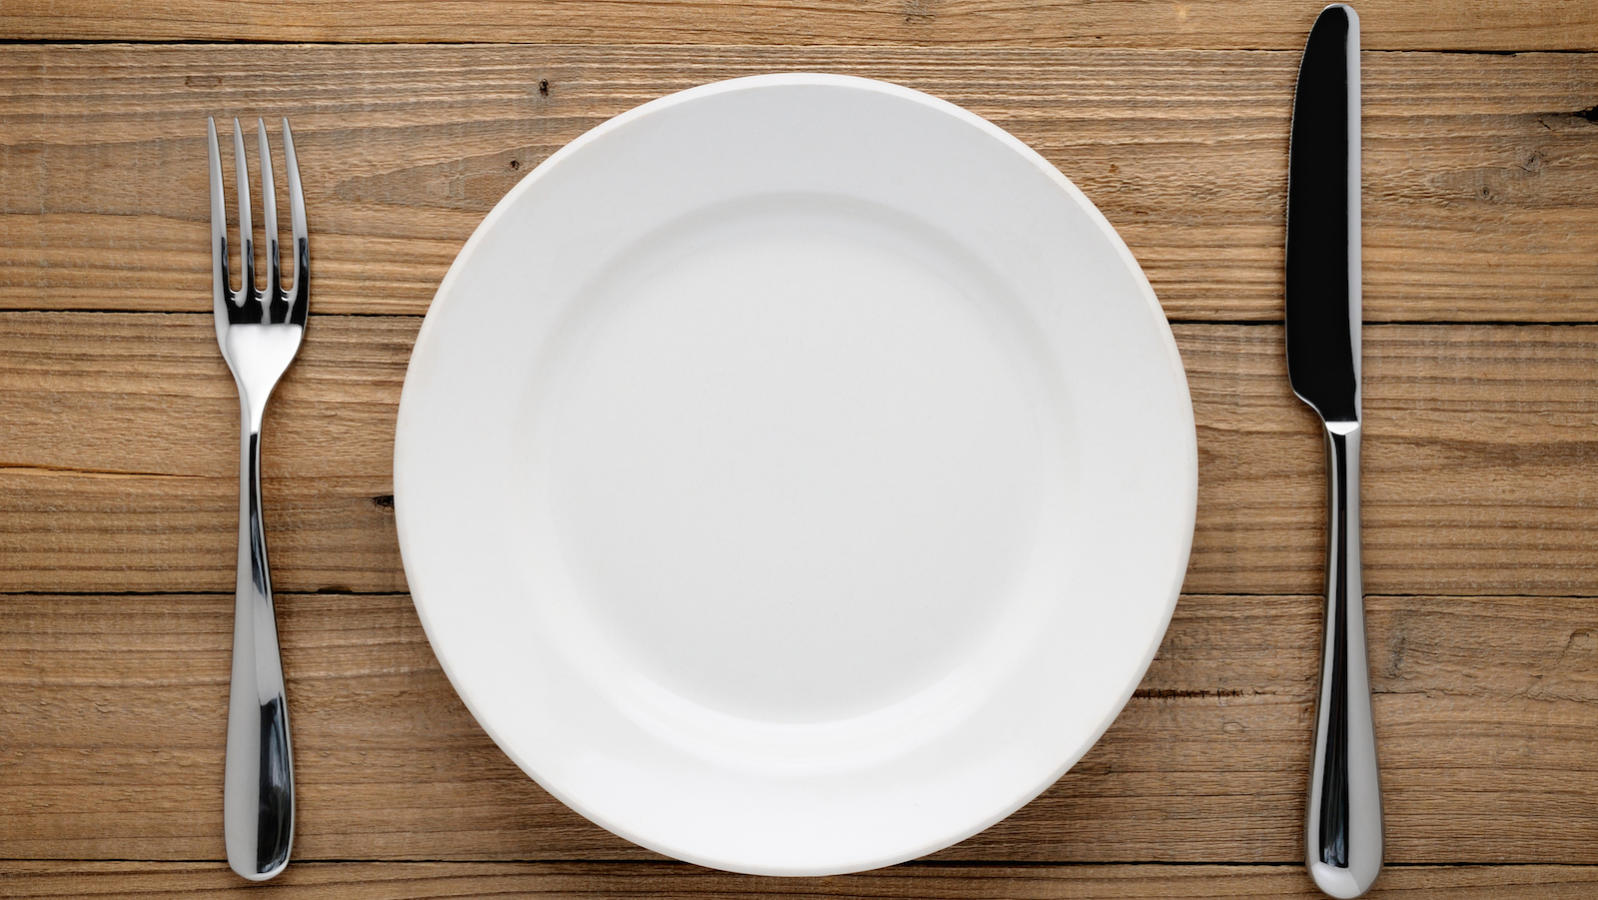 Yom Kippur Fasting: The Details | My Jewish Learning